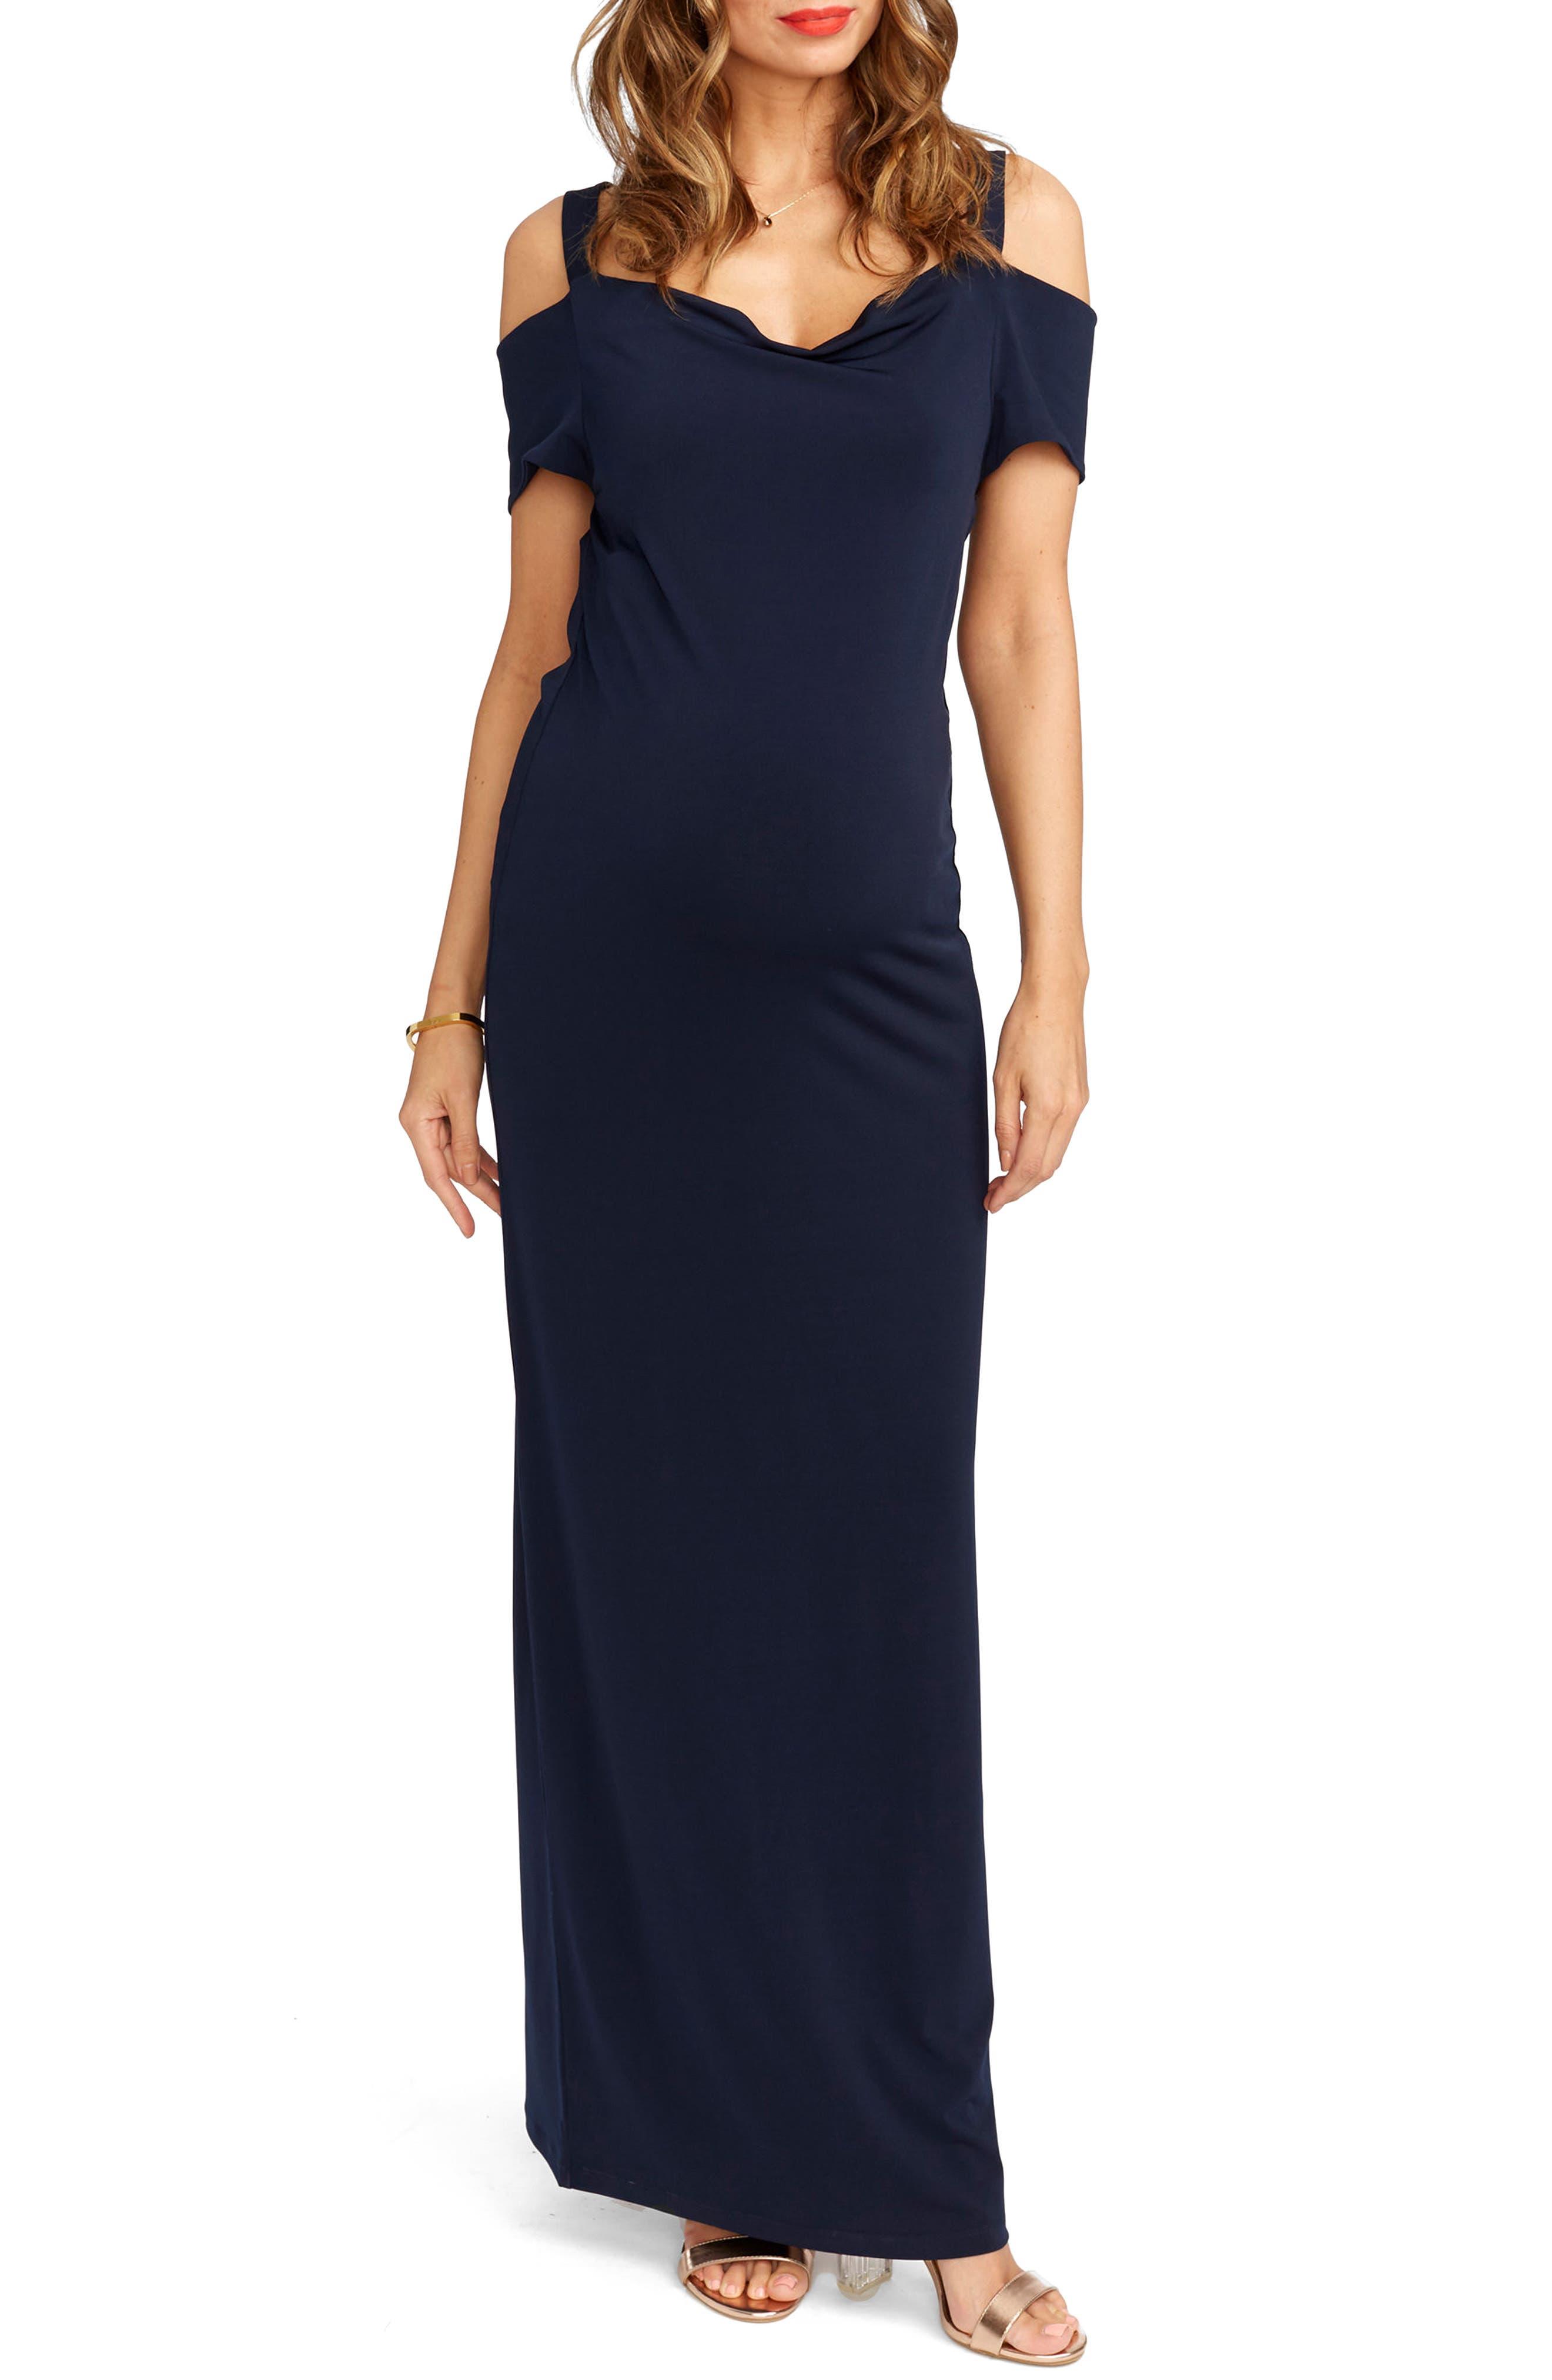 Rosie Pope Jillian Cold Shoulder Maternity Maxi Dress